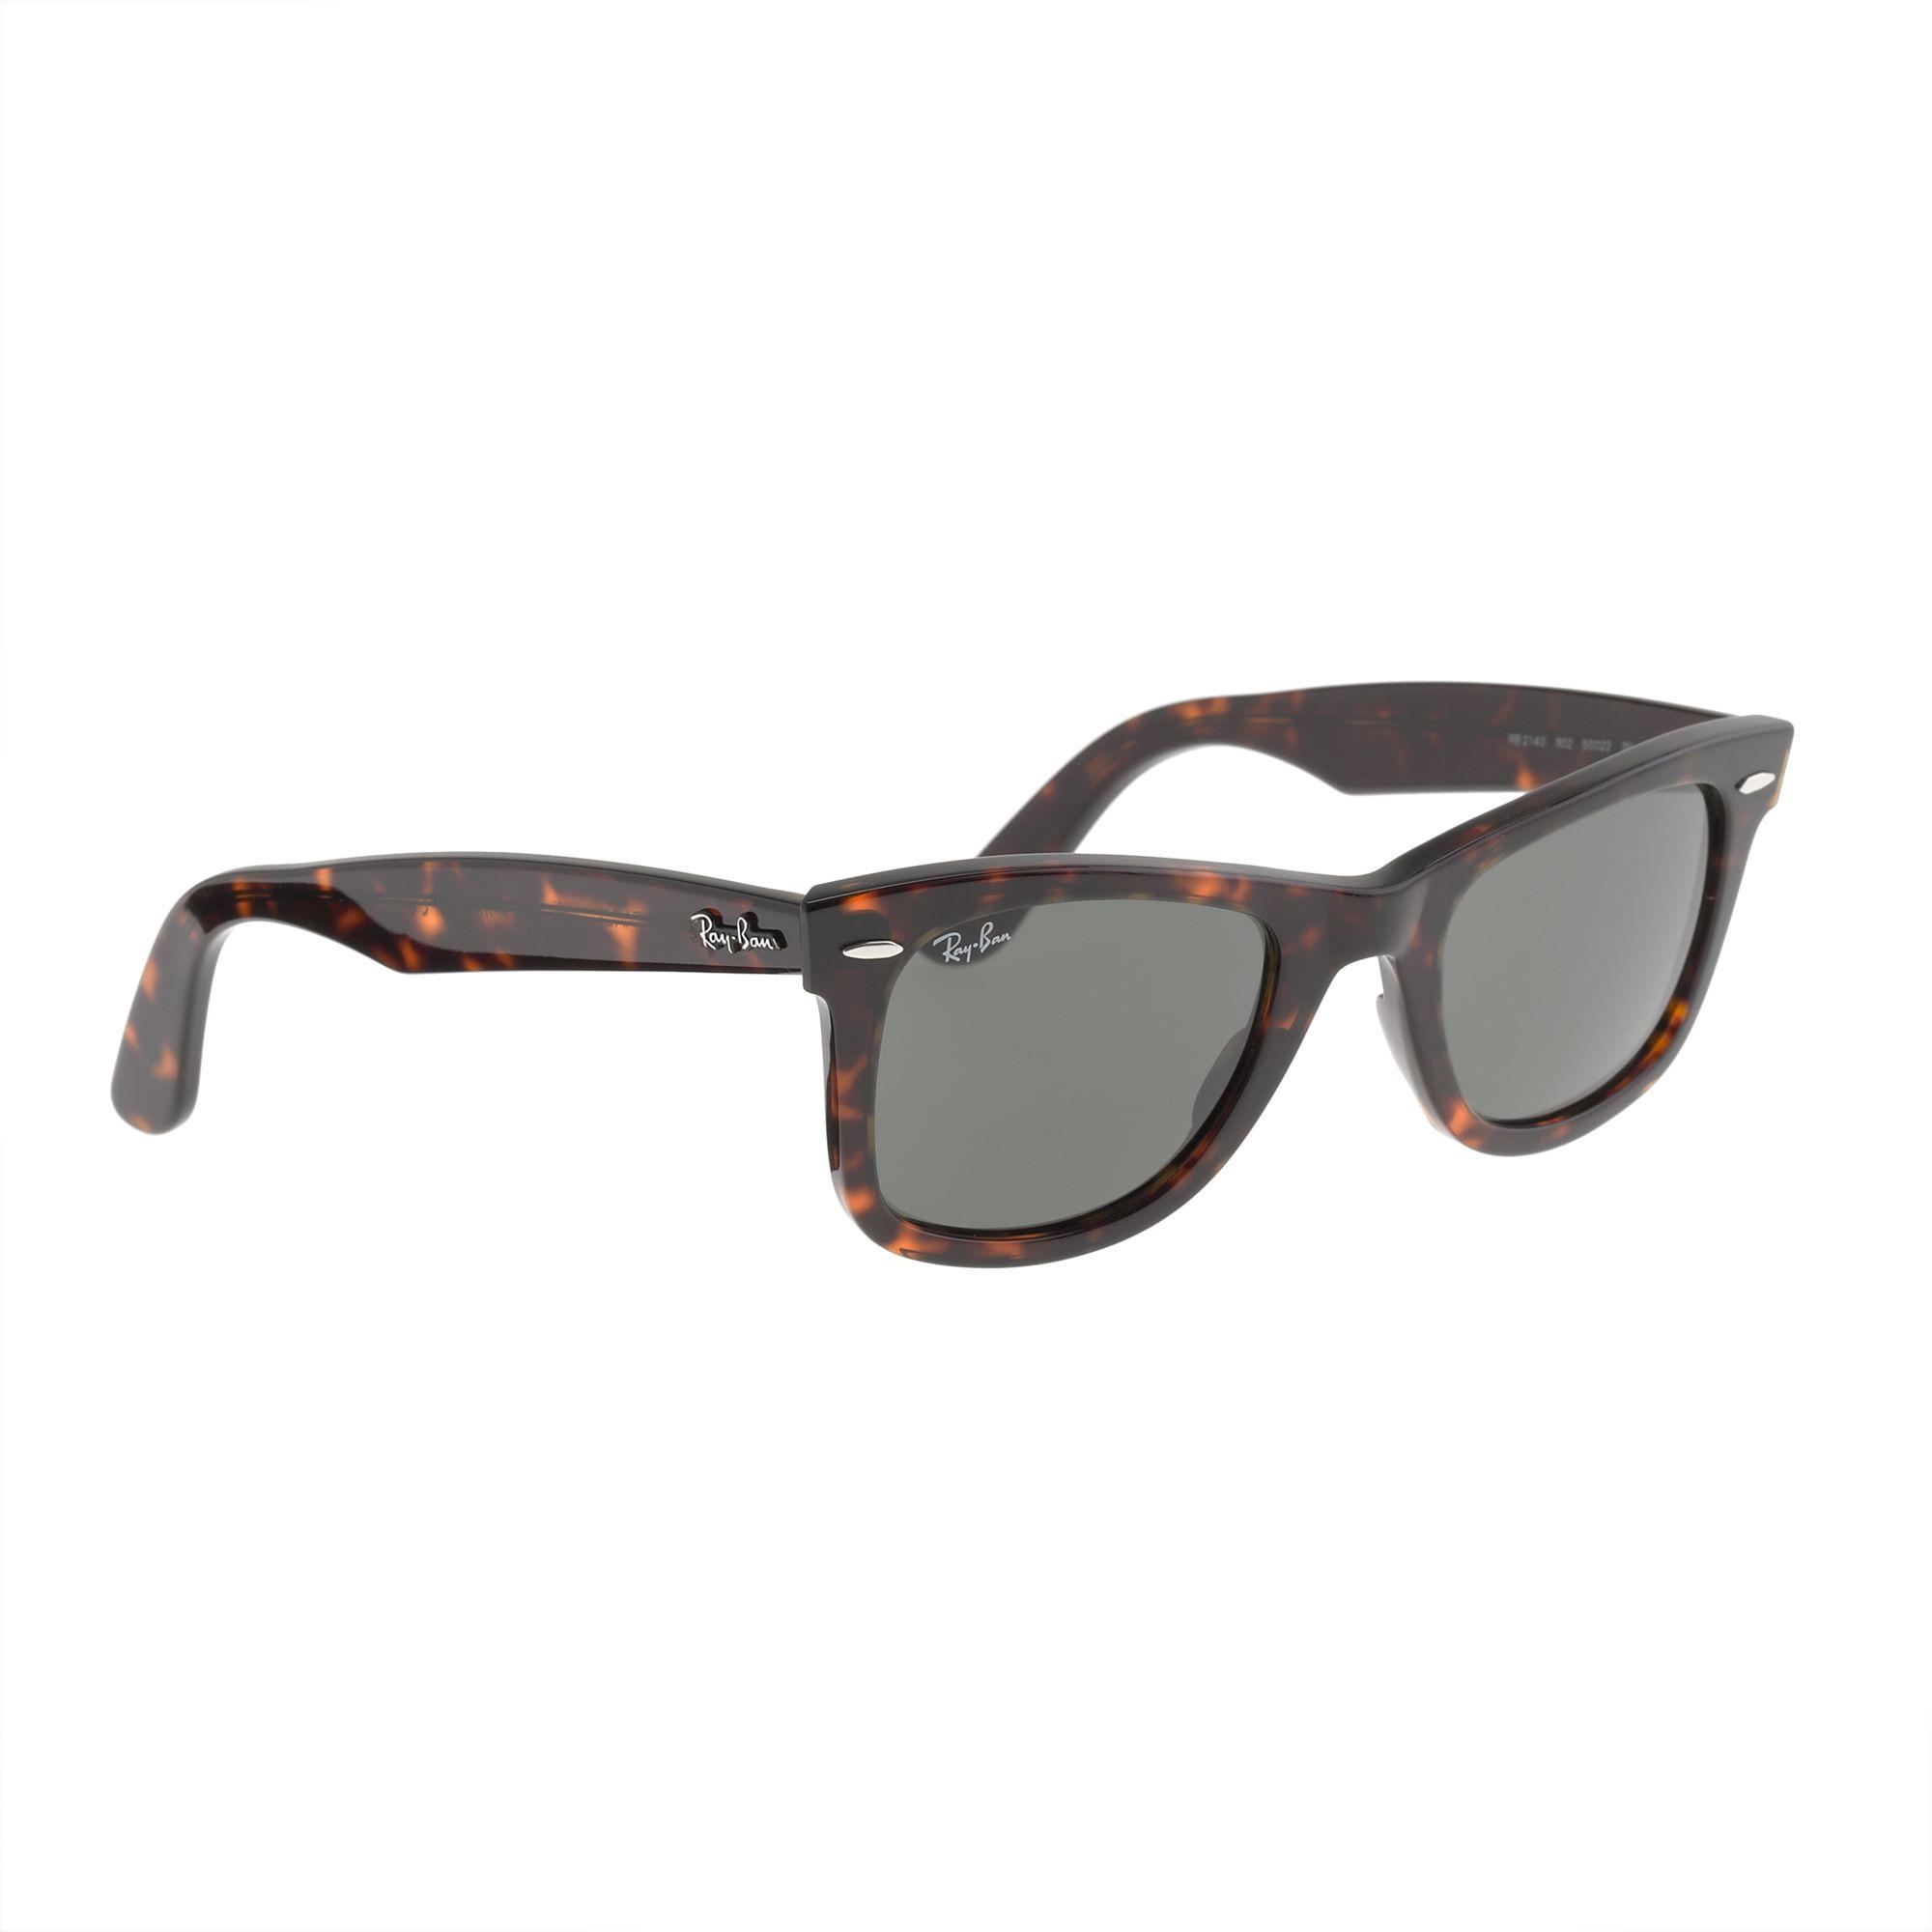 ... hakim optical ray ban sunglasses ...